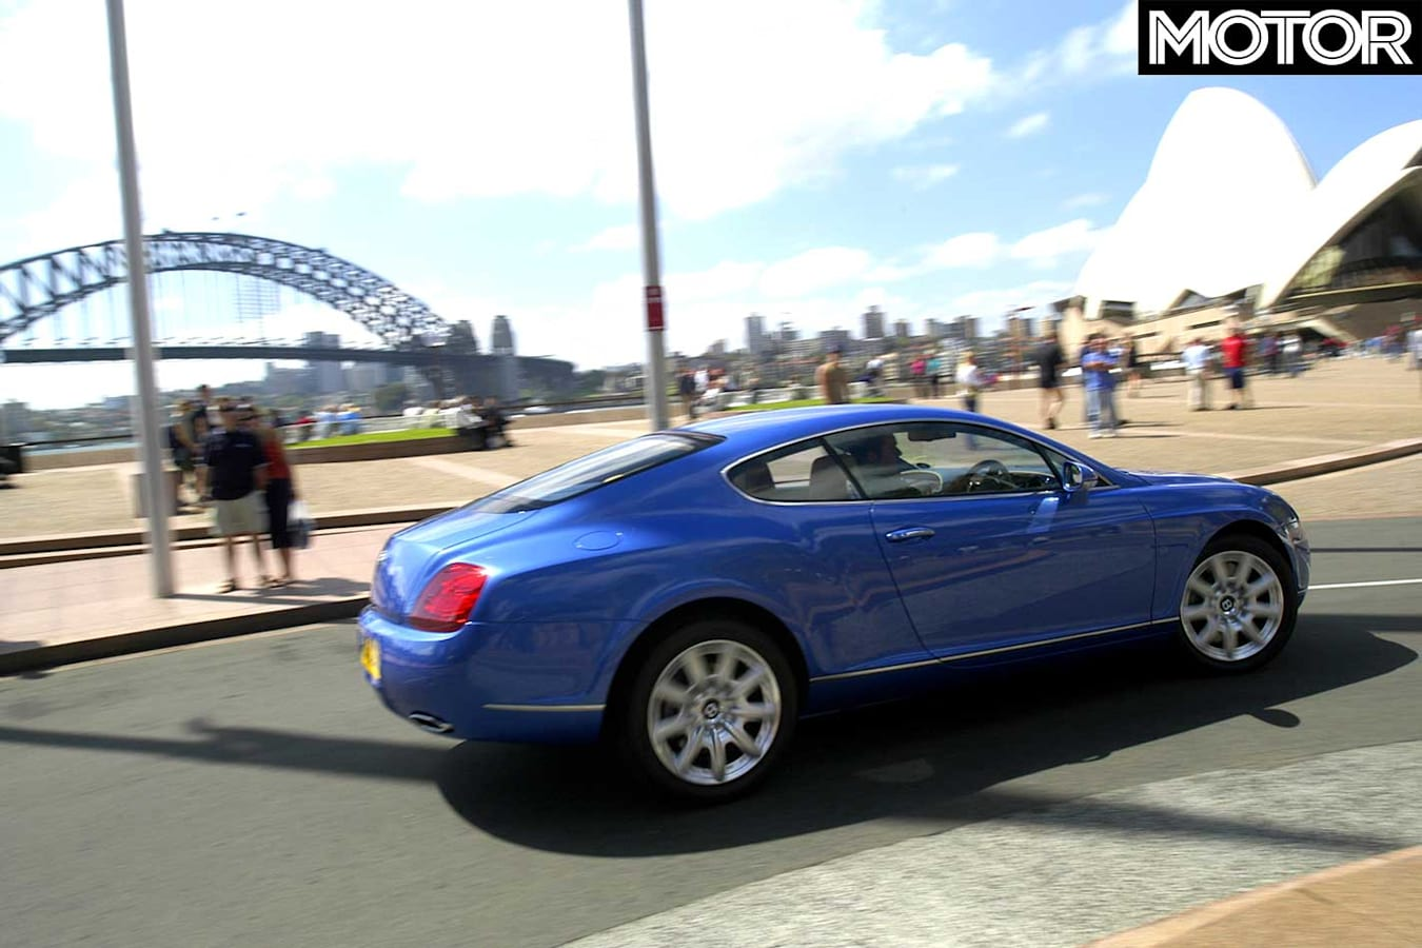 2004 Bentley Continental GT Rear Jpg